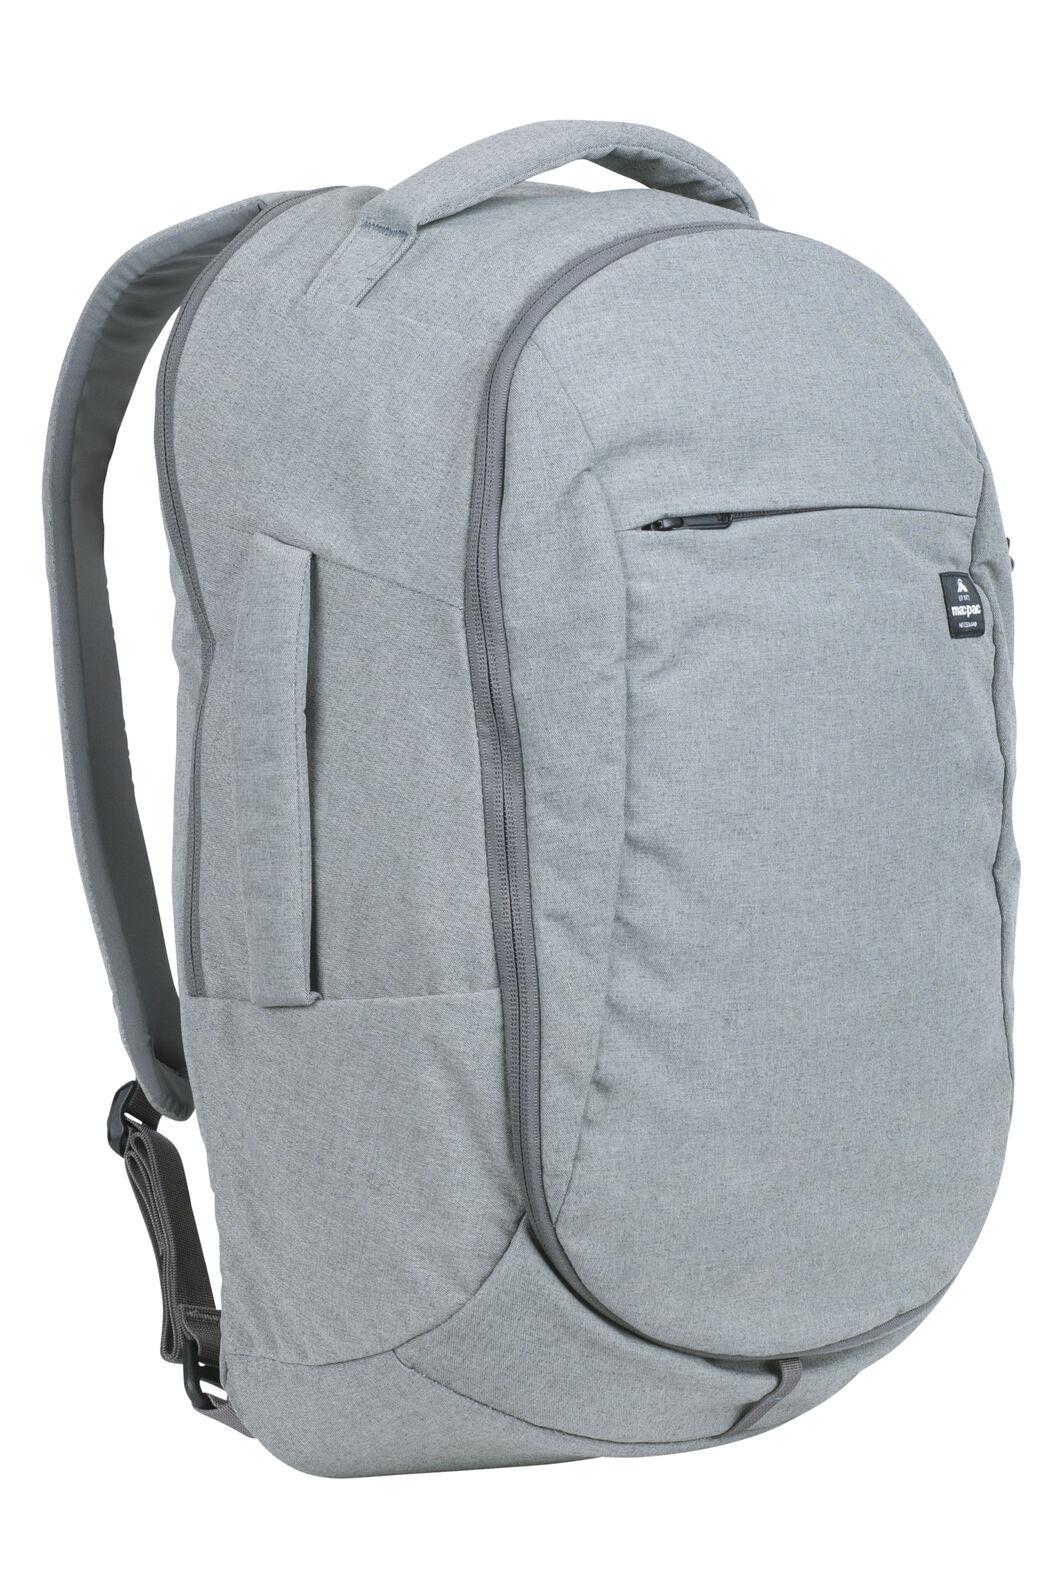 Macpac UTSIFOY 1.1 25L Backpack, Castor Grey, hi-res